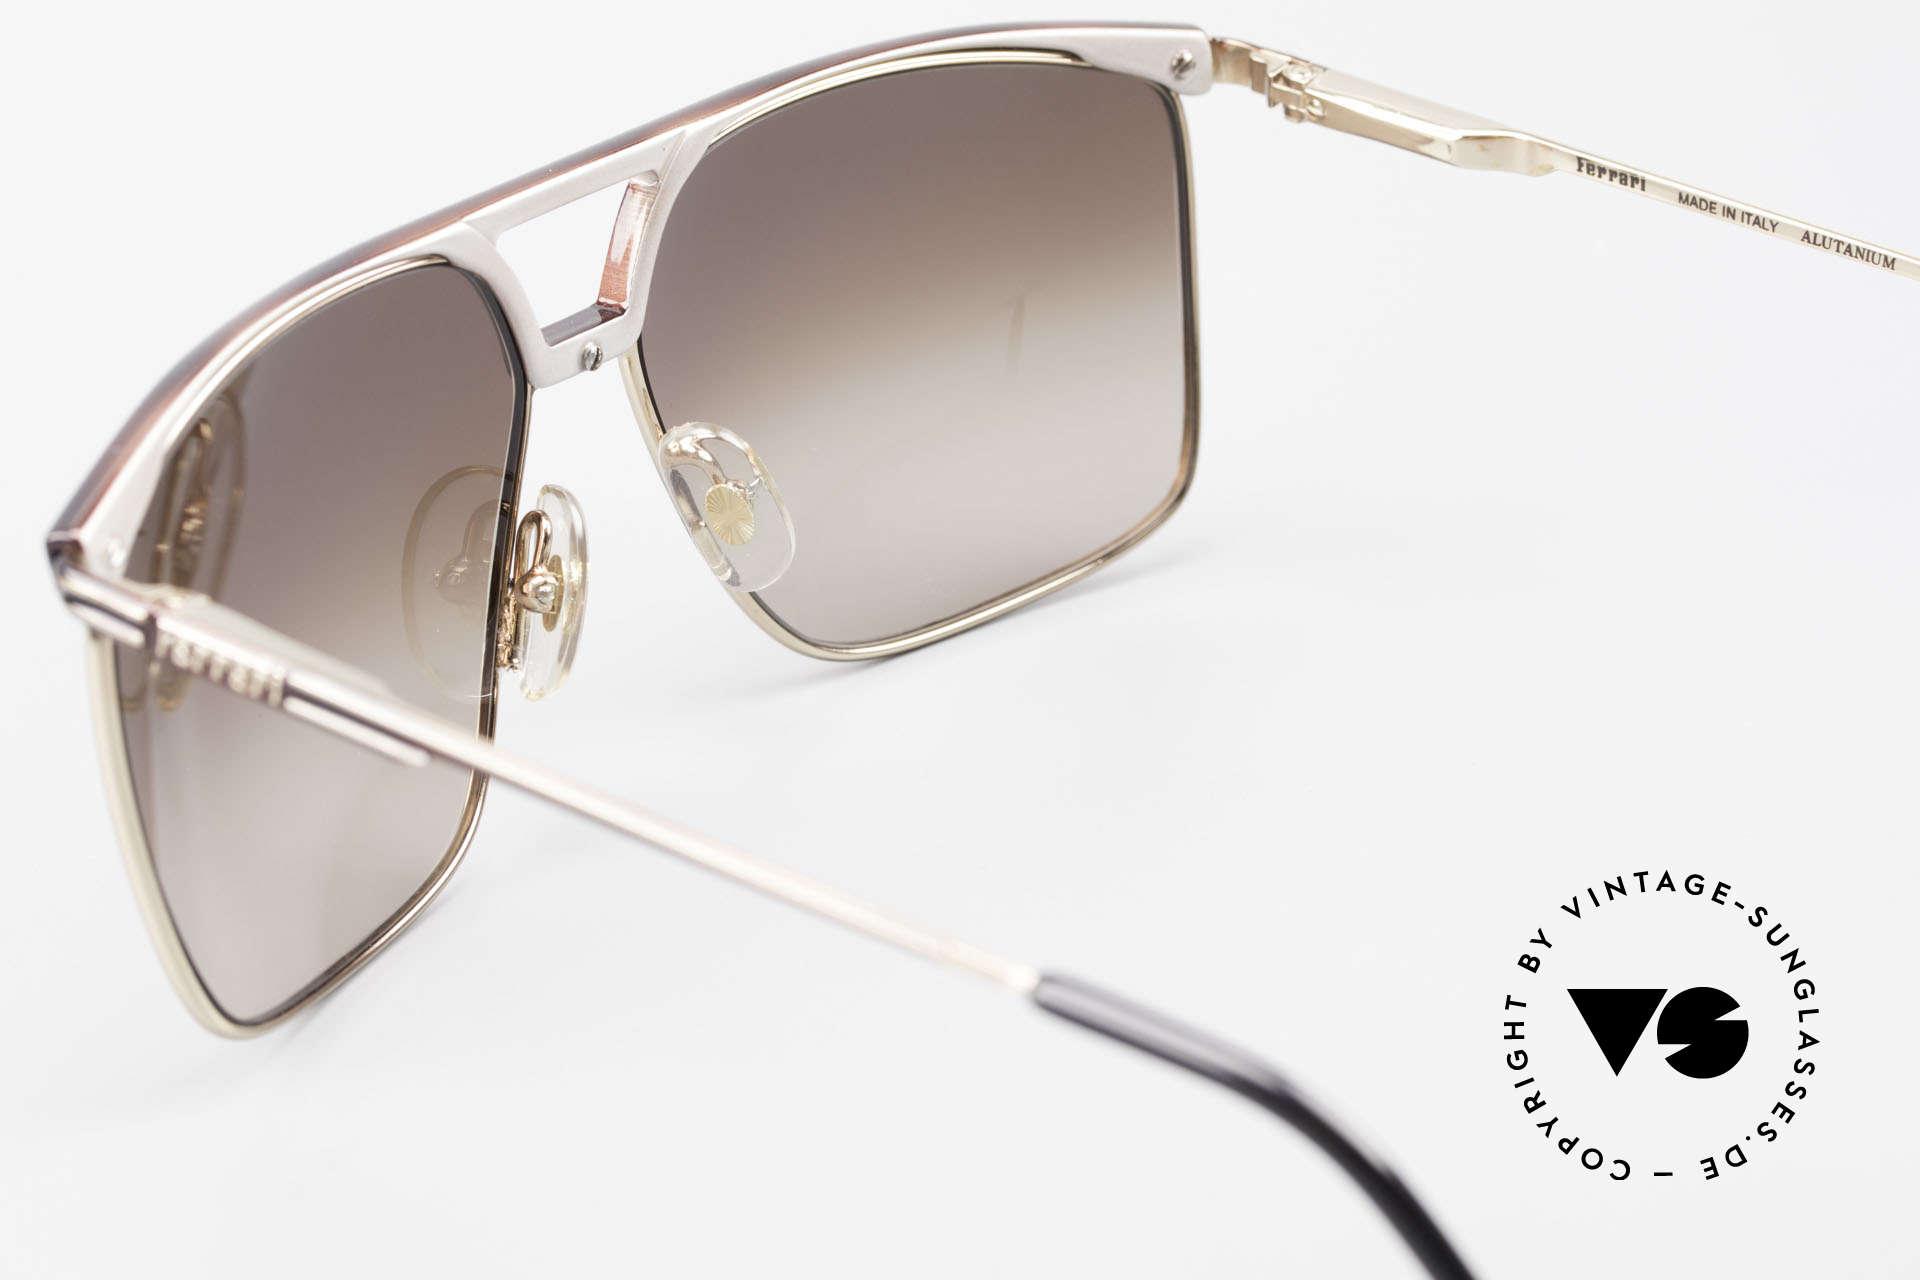 Ferrari F35 Formula 1 Sunglasses X-Large, Size: extra large, Made for Men